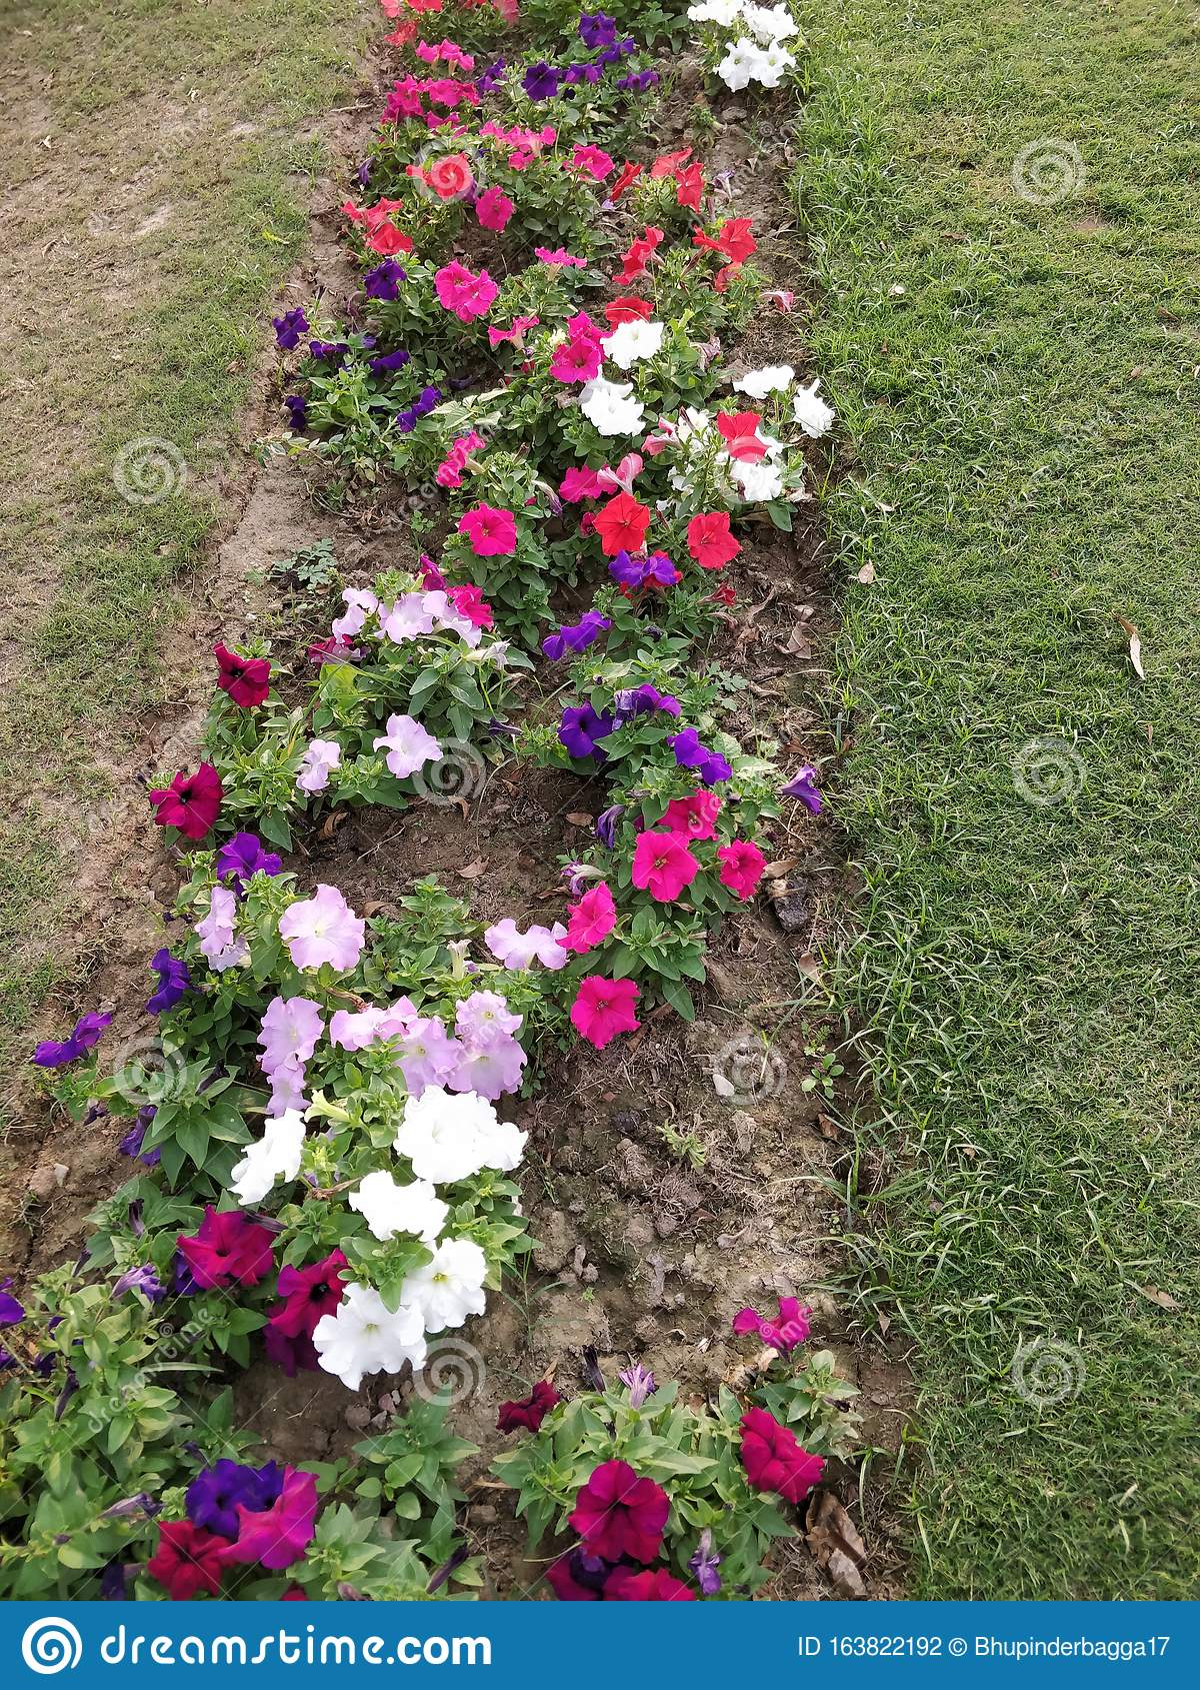 Roadside Lawn With Multicolored Petunia Flower Bed Stock Photo Image Of Roadside Petunia 163822192